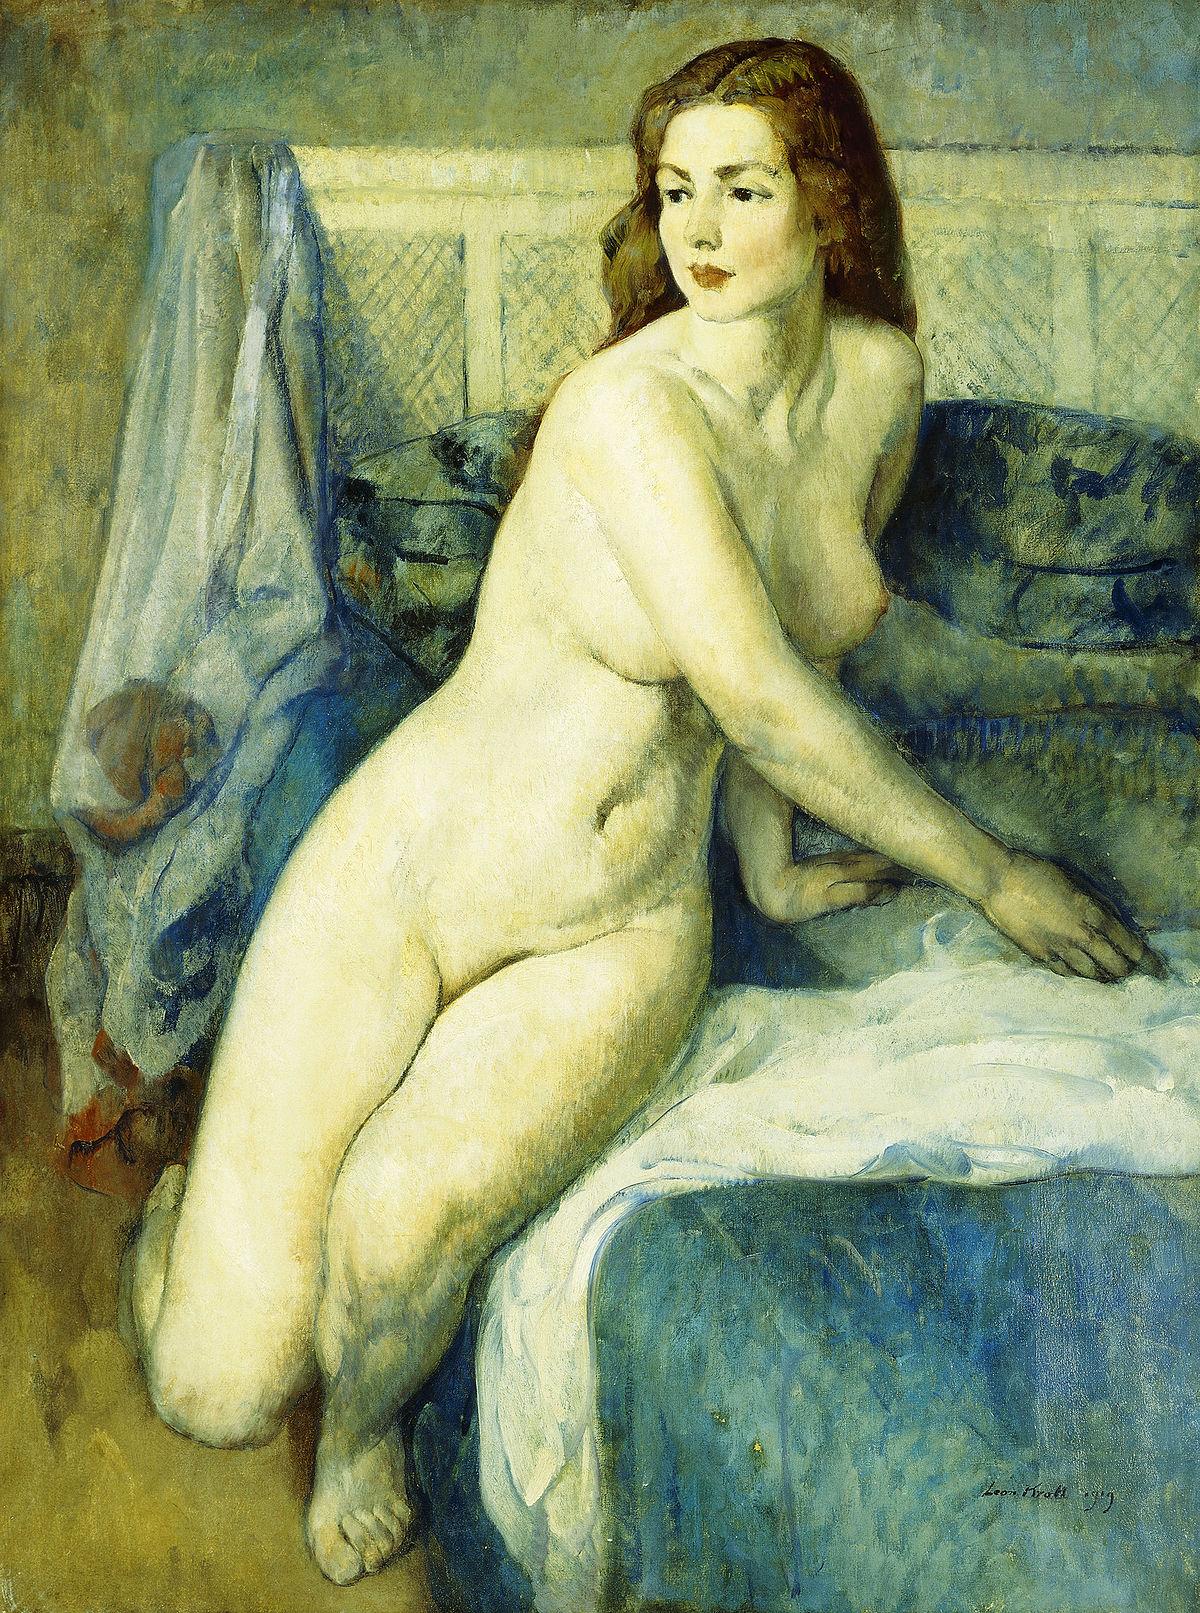 http://upload.wikimedia.org/wikipedia/commons/thumb/2/29/Leon_Kroll_-_Nude_in_a_Blue_Interior%2C_1919.jpg/1200px-Leon_Kroll_-_Nude_in_a_Blue_Interior%2C_1919.jpg